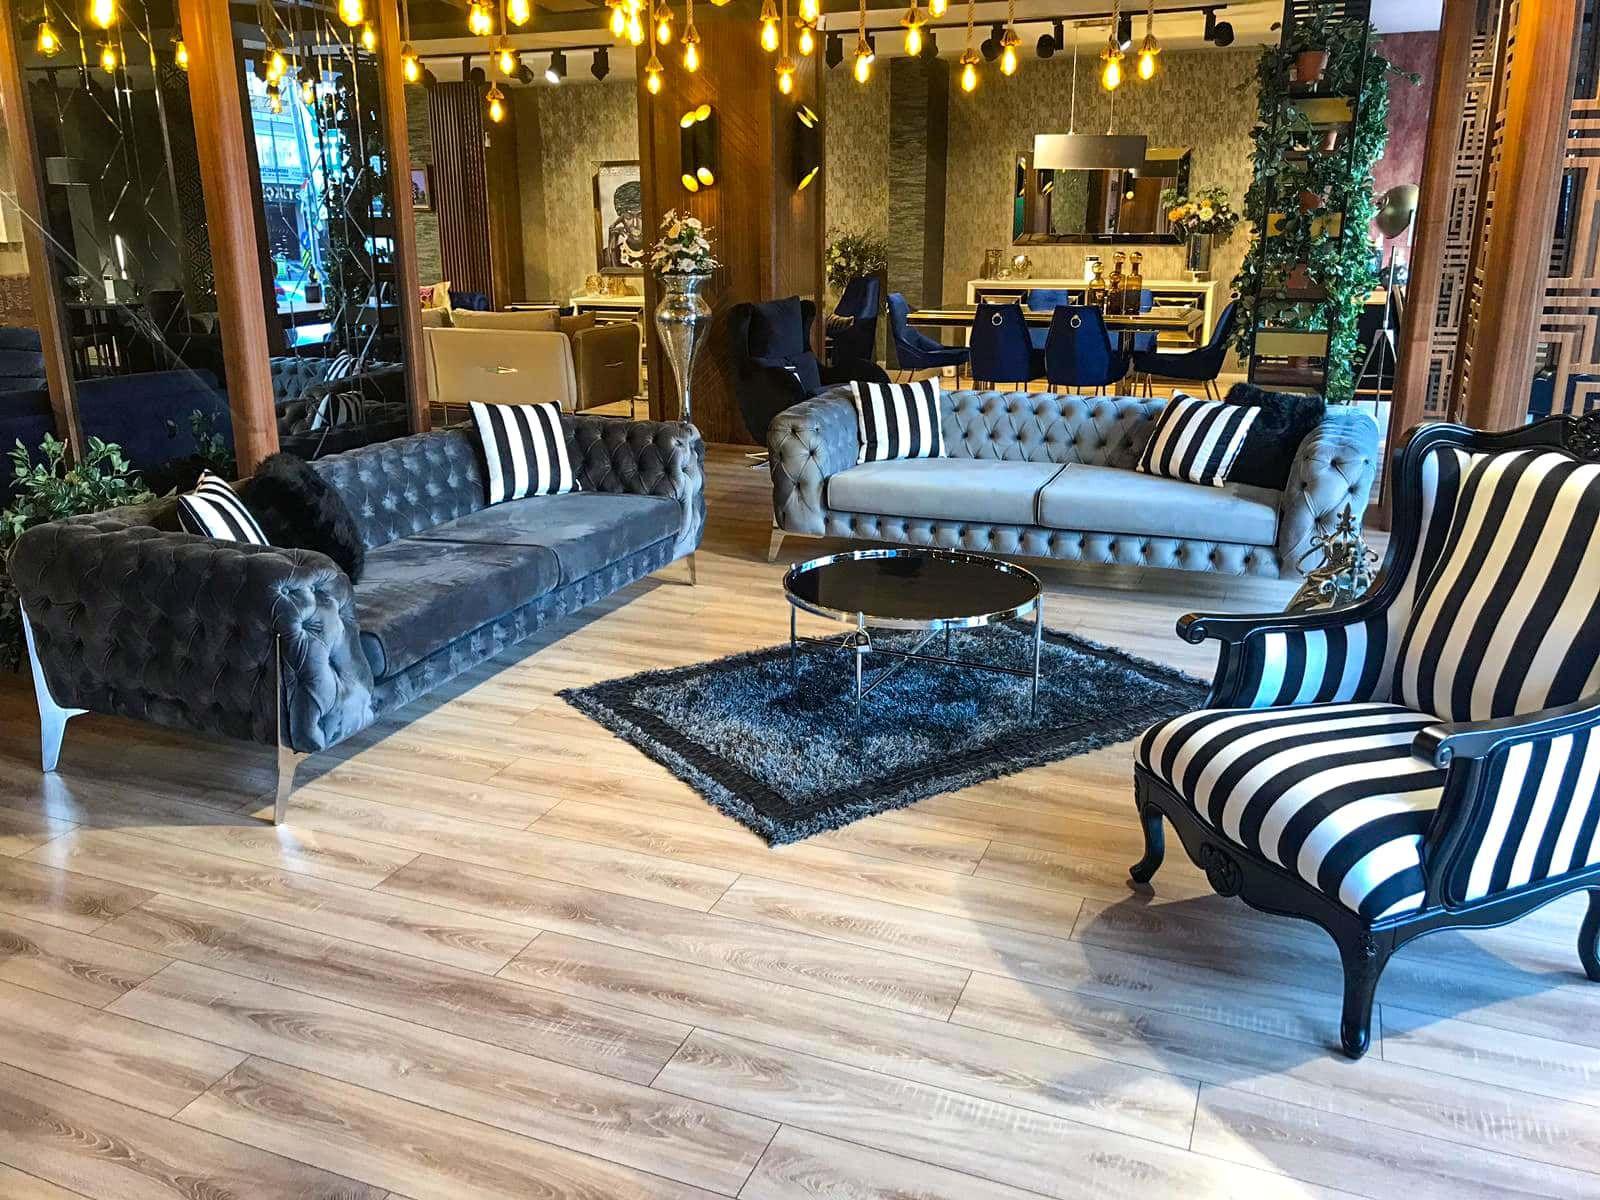 Zebra Koltuk Takimi Modern Cizgileri Ve Kullanisli Dizayniyla Tanriverdi Mobilya Guvencesiyle Beg 2020 Minimalist Oturma Odalari Luks Oturma Odalari Oturma Odalari